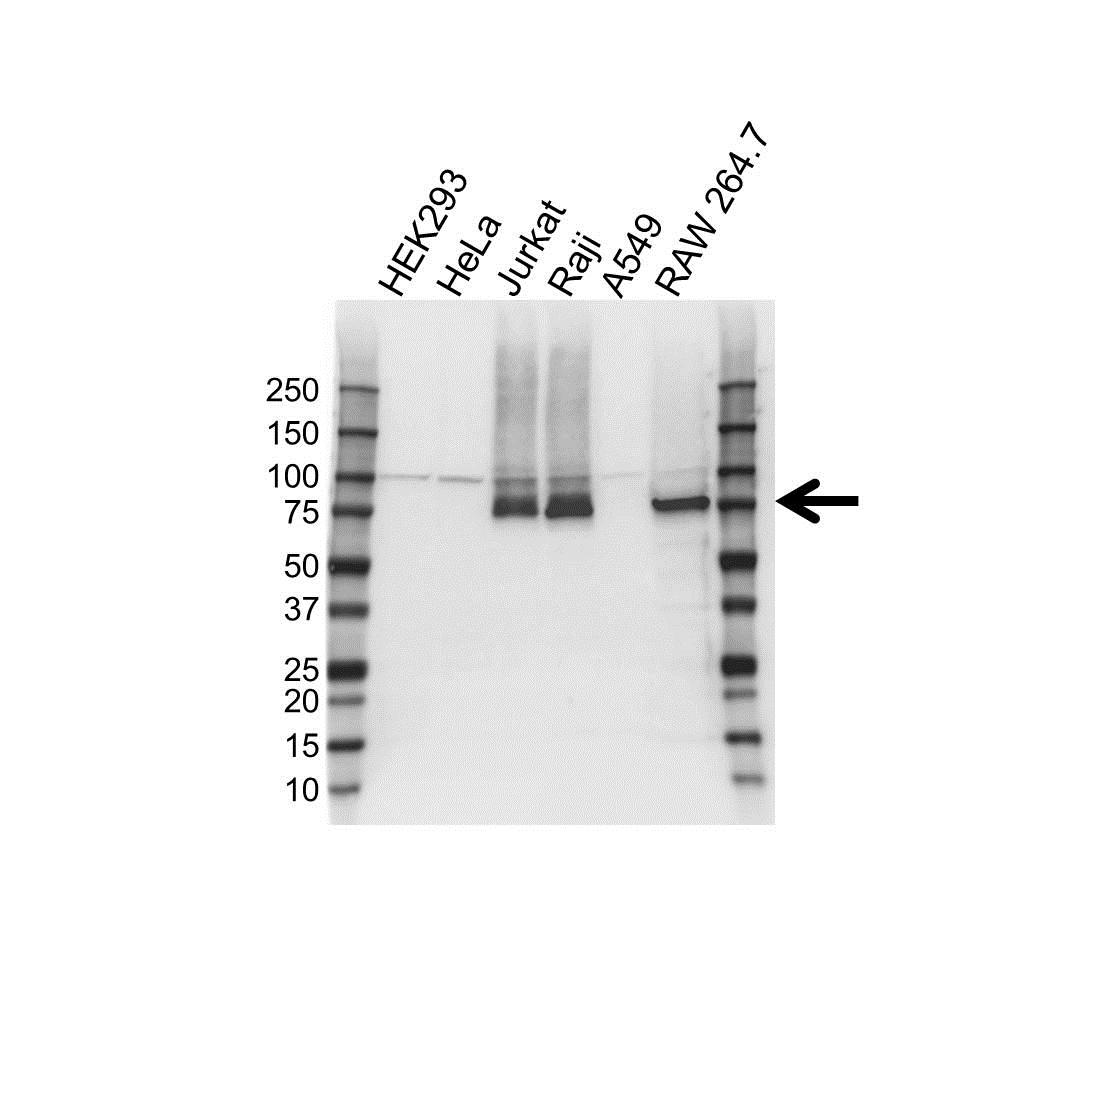 Anti FERMT3 Antibody, clone OTI2G2 (PrecisionAb Monoclonal Antibody) gallery image 1